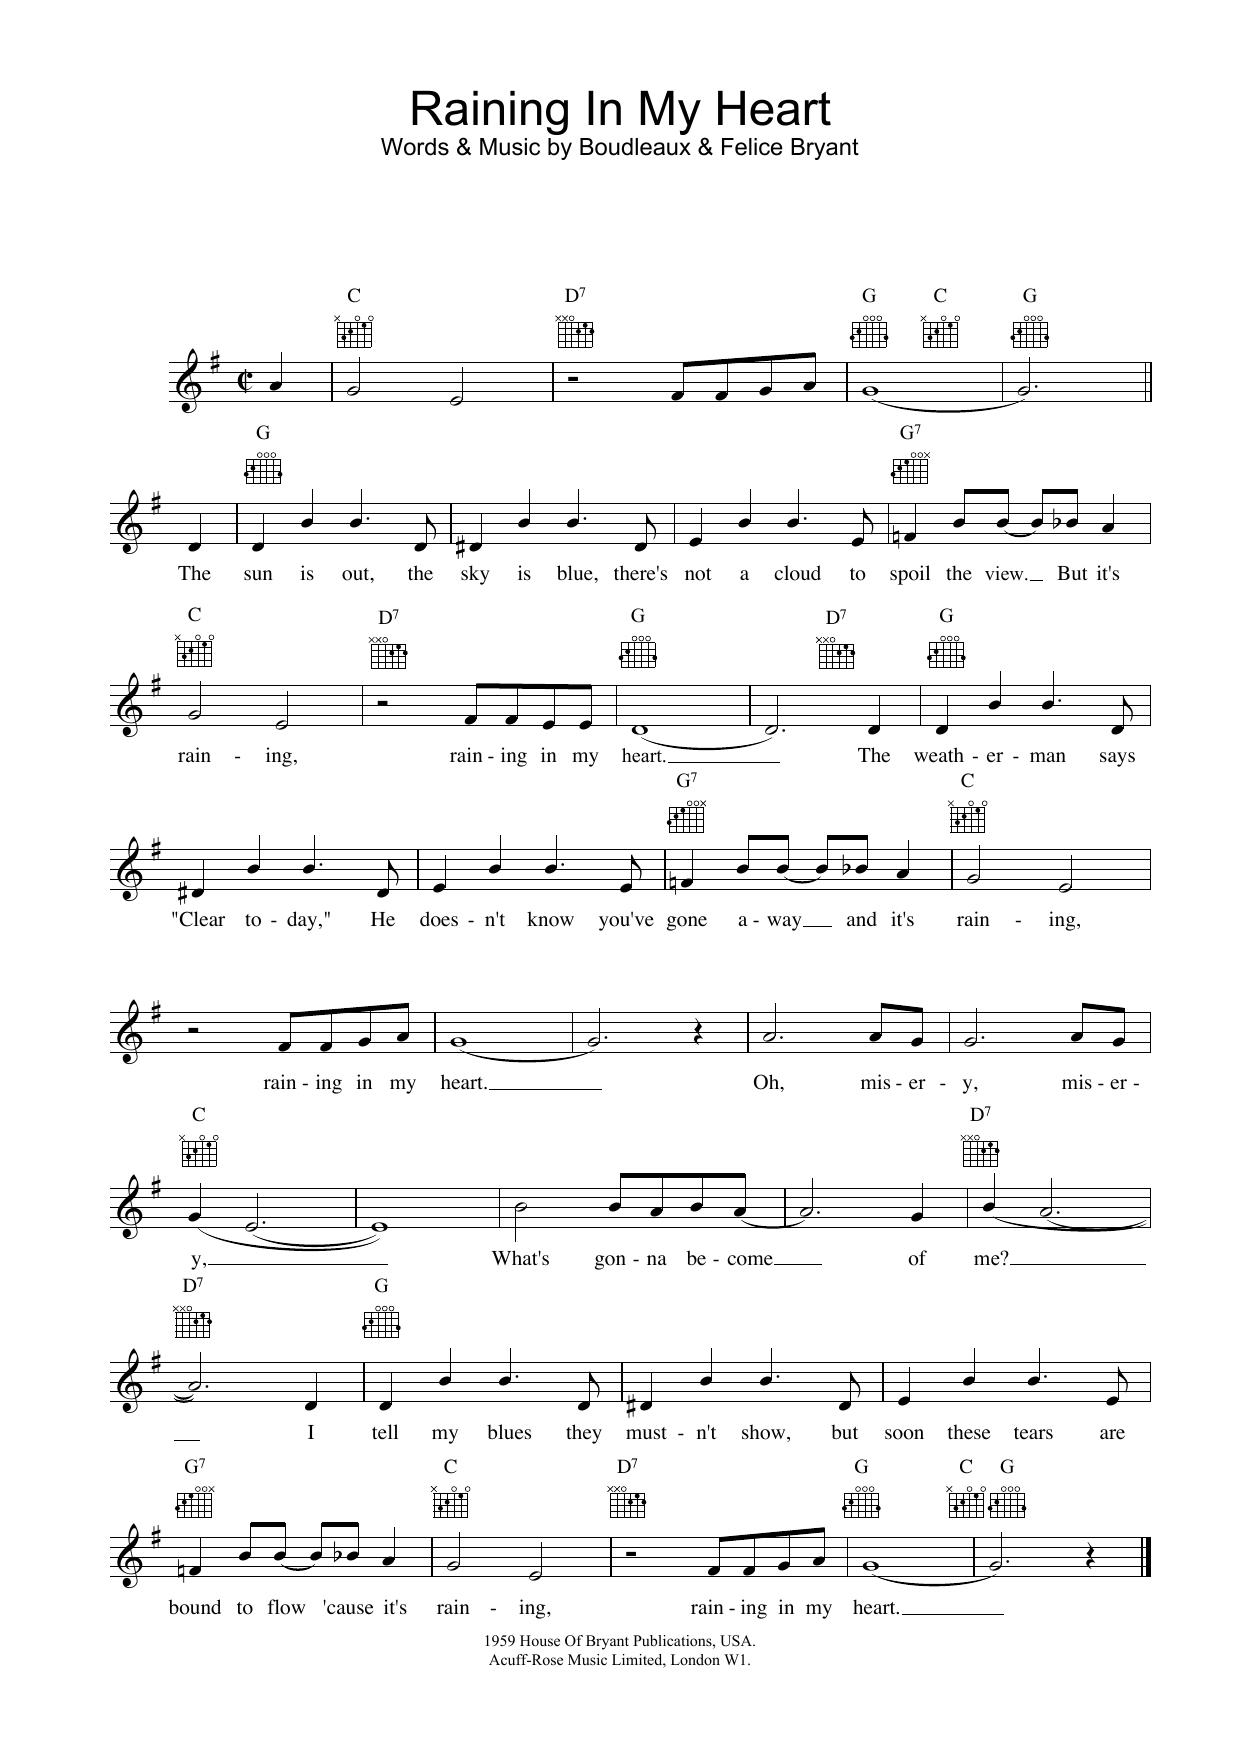 Raining In My Heart sheet music